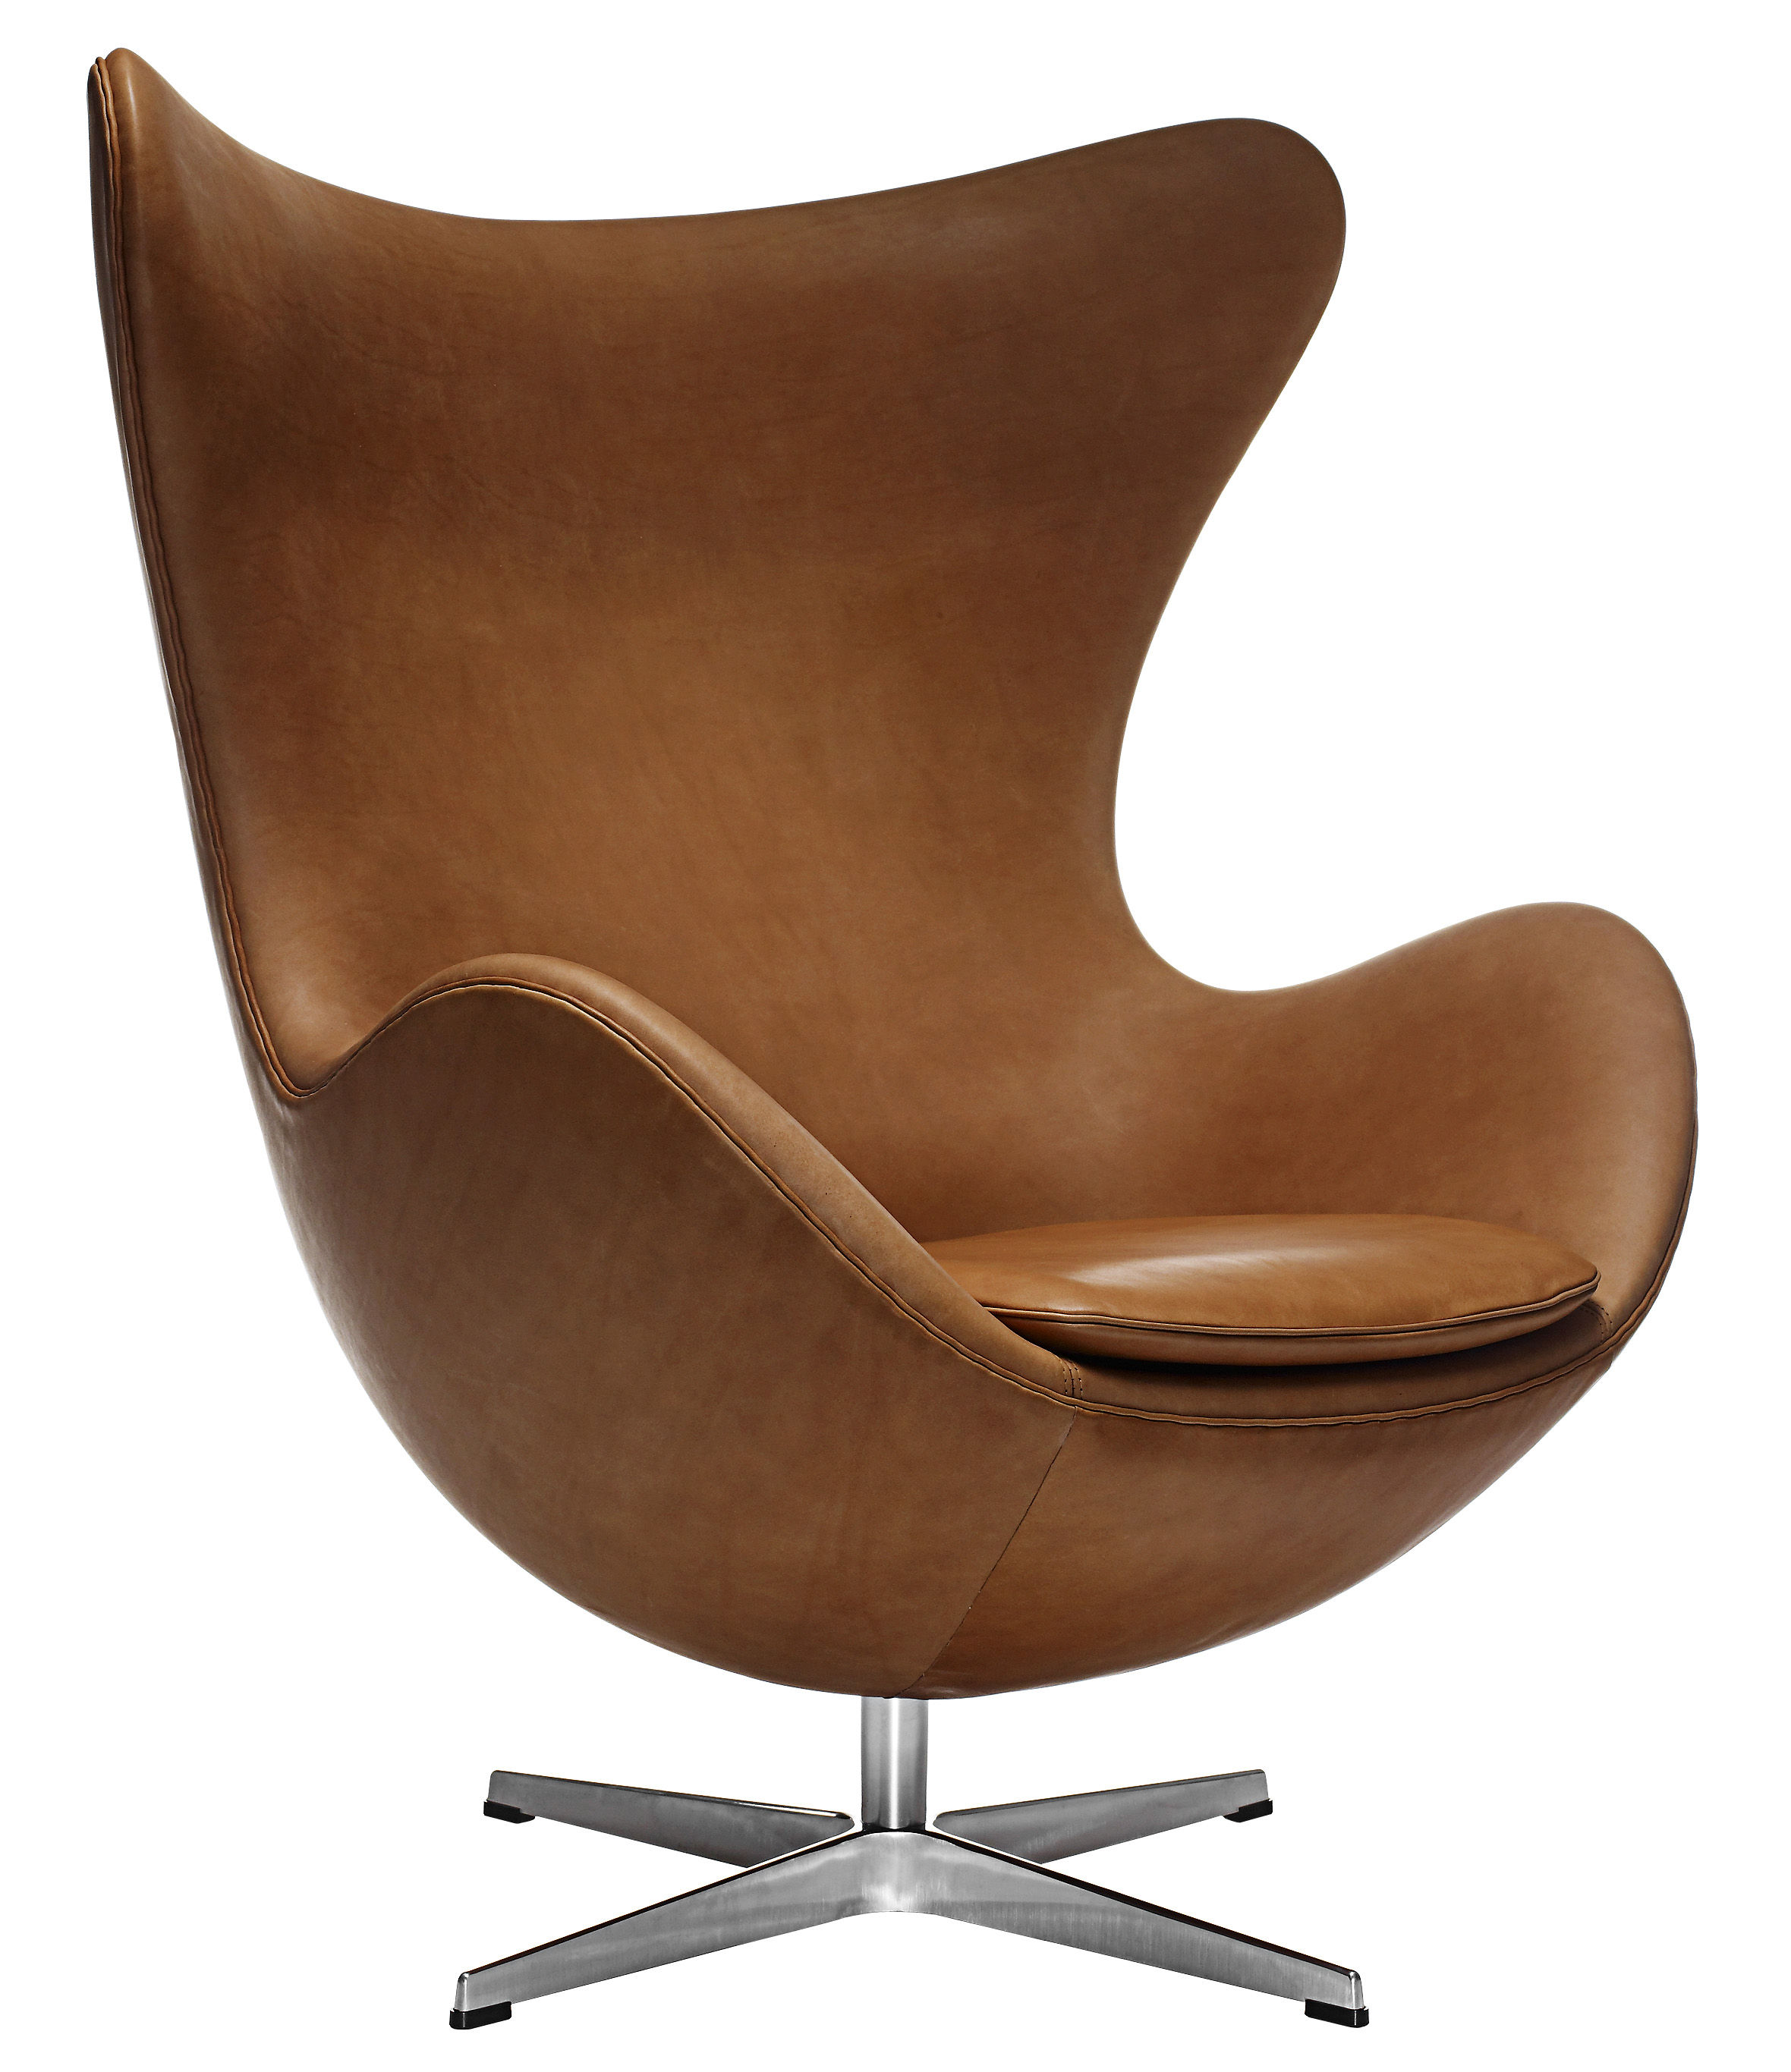 Egg chair Swivel armchair  leather by Fritz Hansen